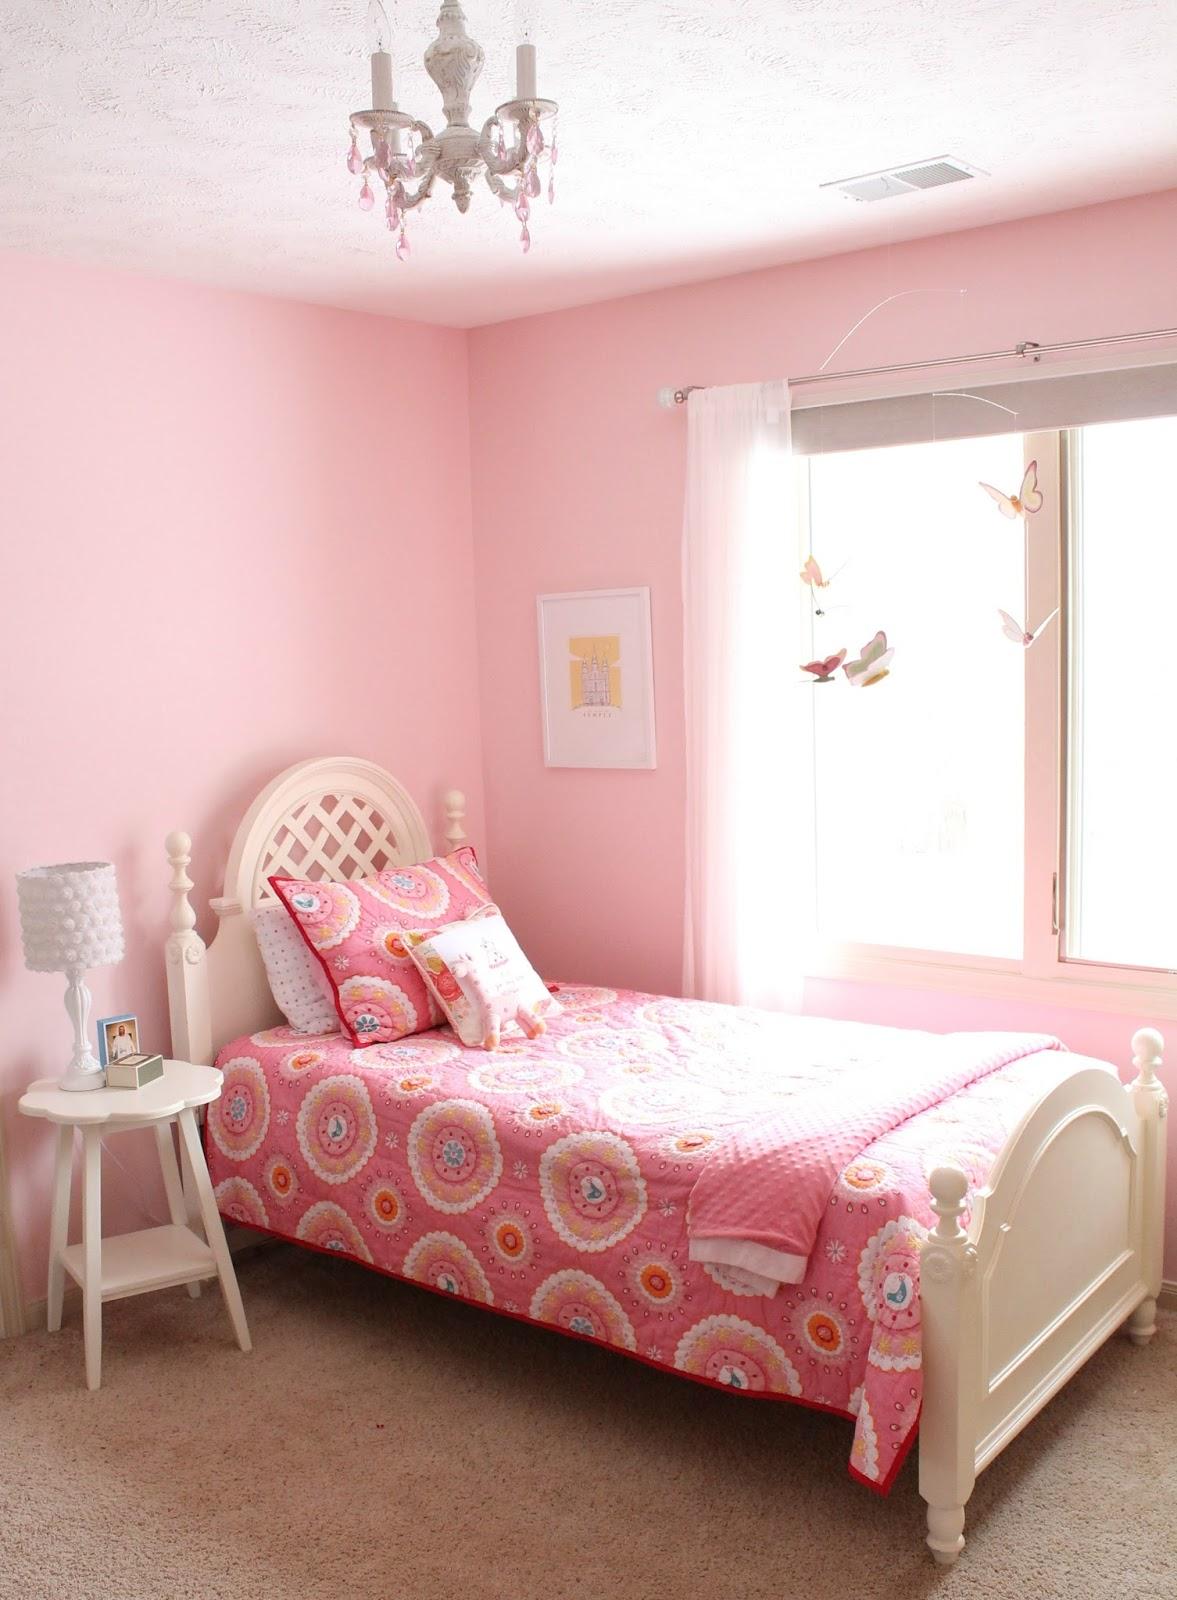 Tessie Fay Emma S Bedroom Reveal